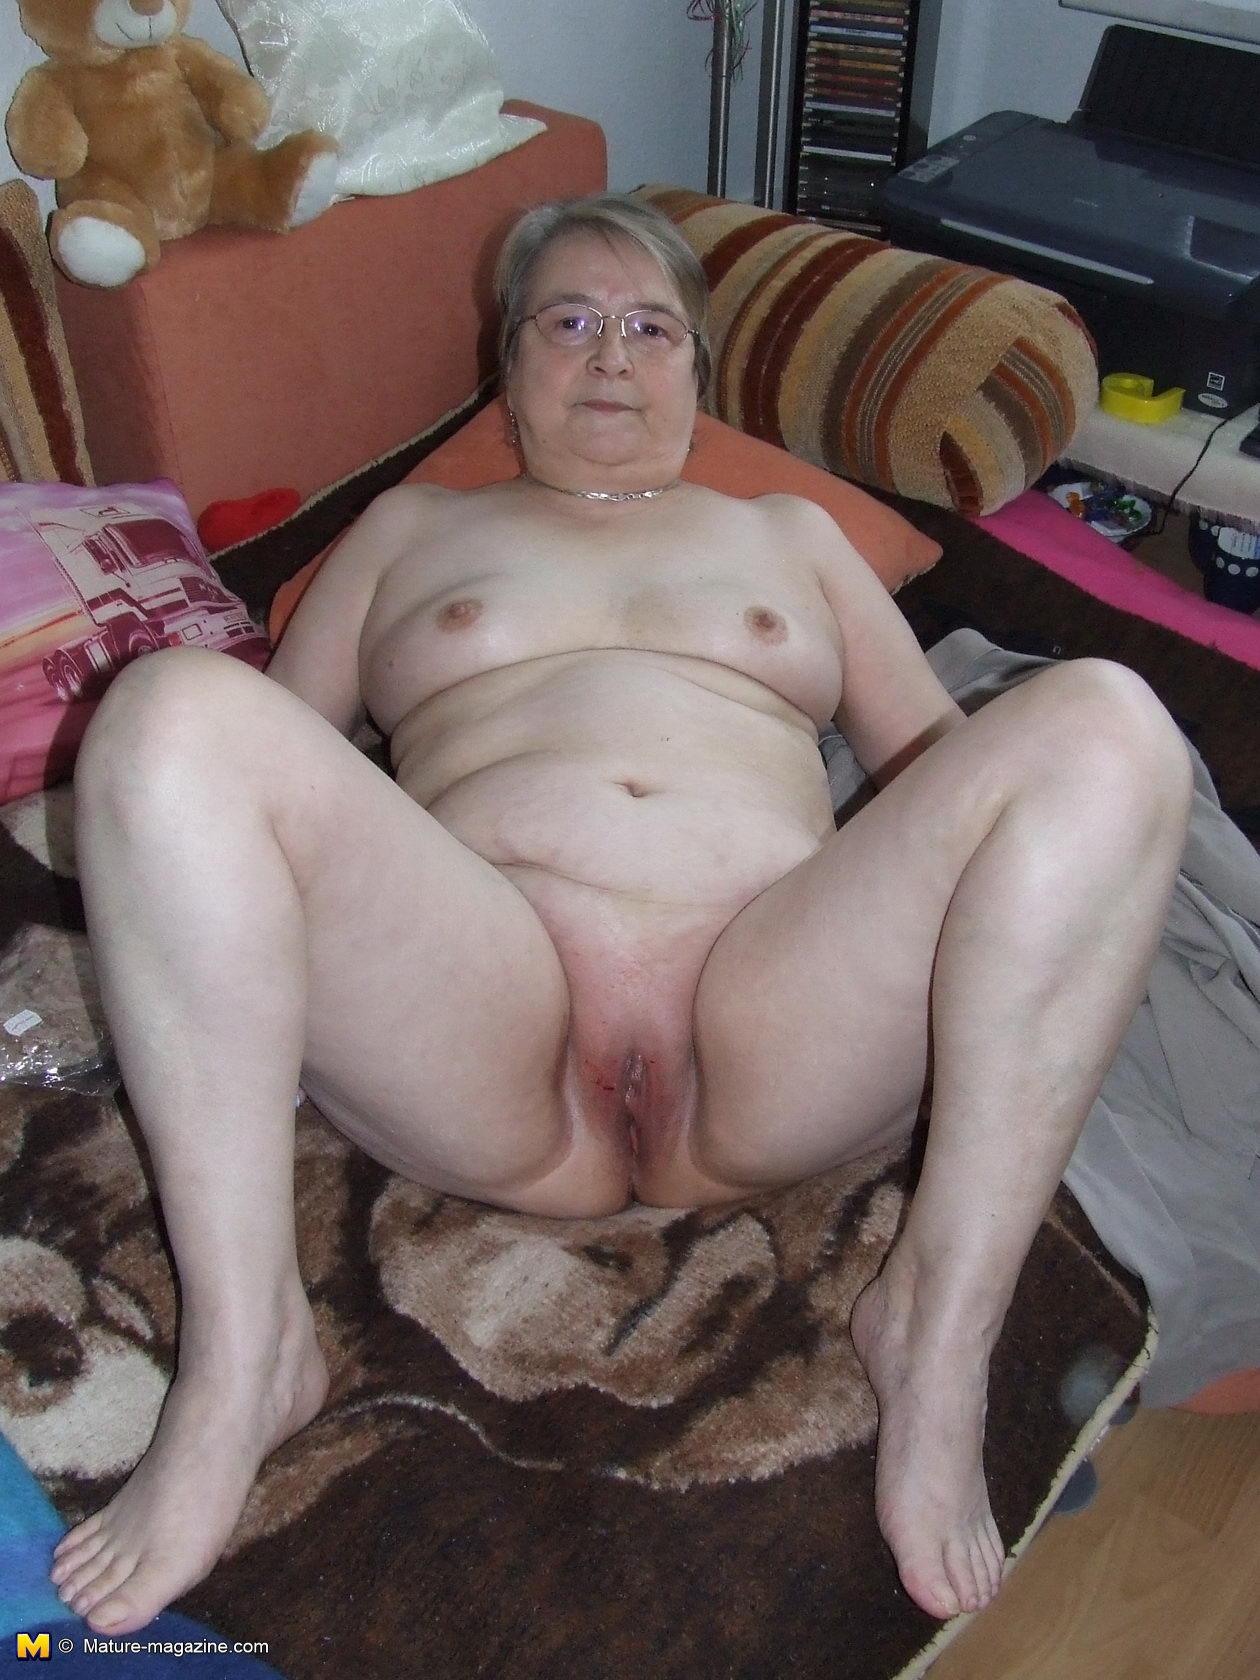 Granny posing nude